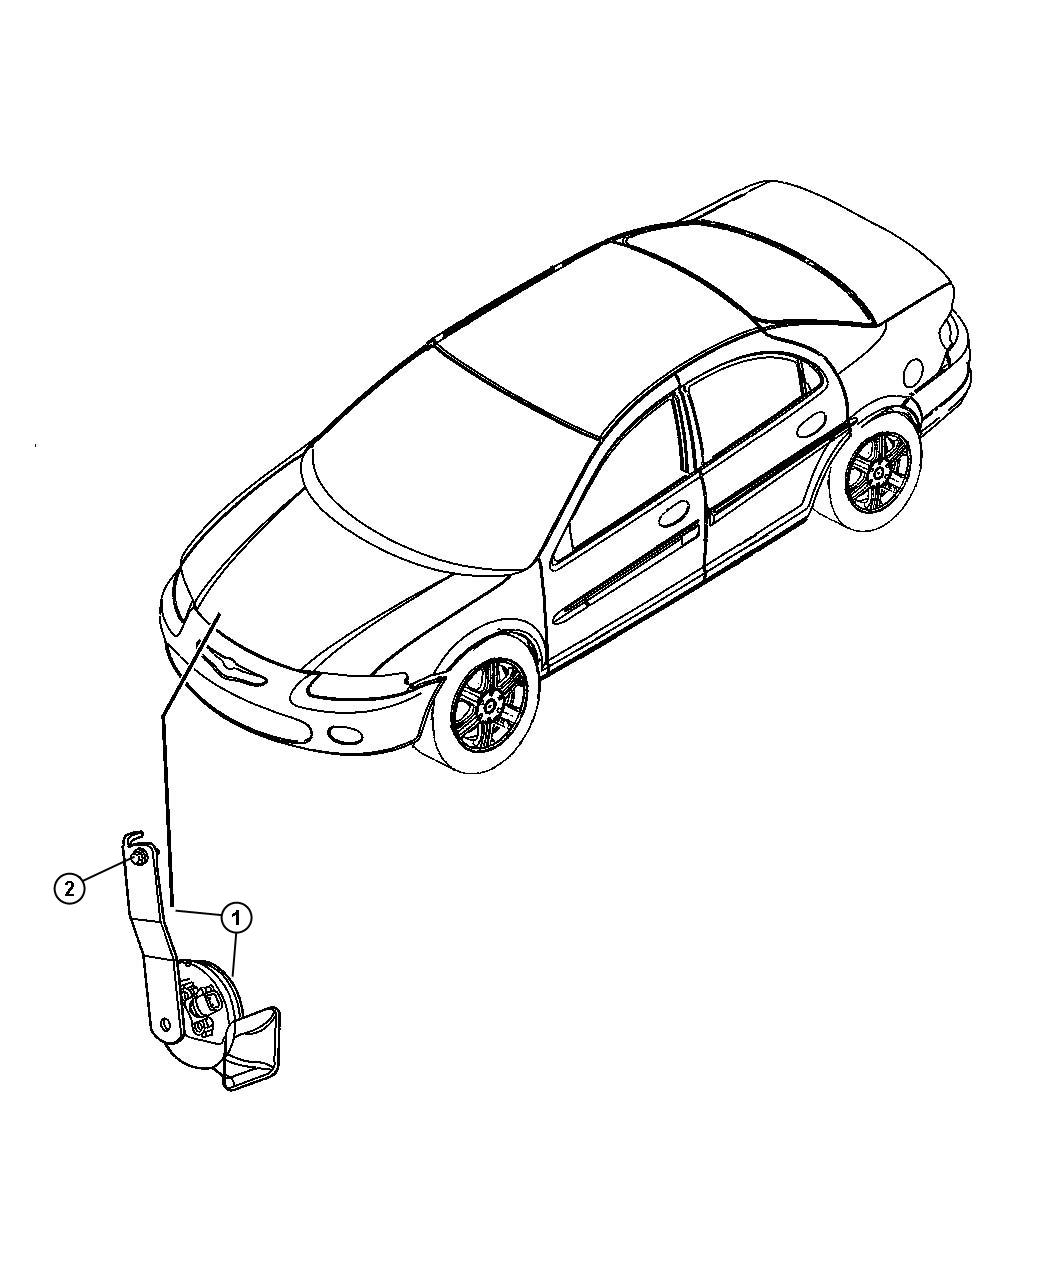 Chrysler Sebring Horn Low Note With Bracket Single